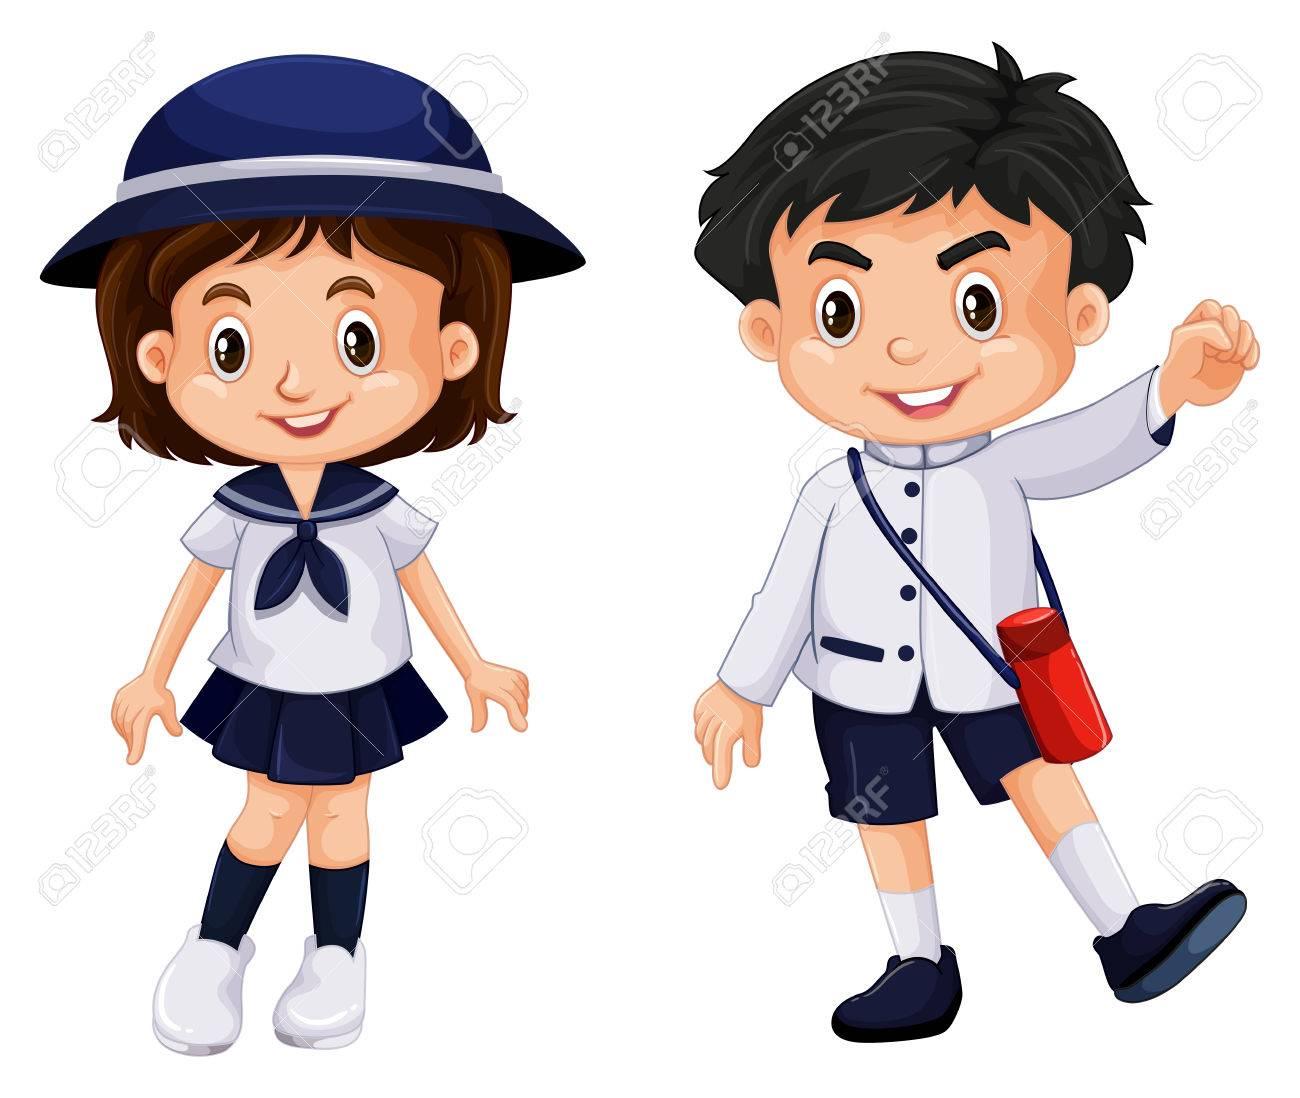 Japanese boy and girl in school uniform illustration.